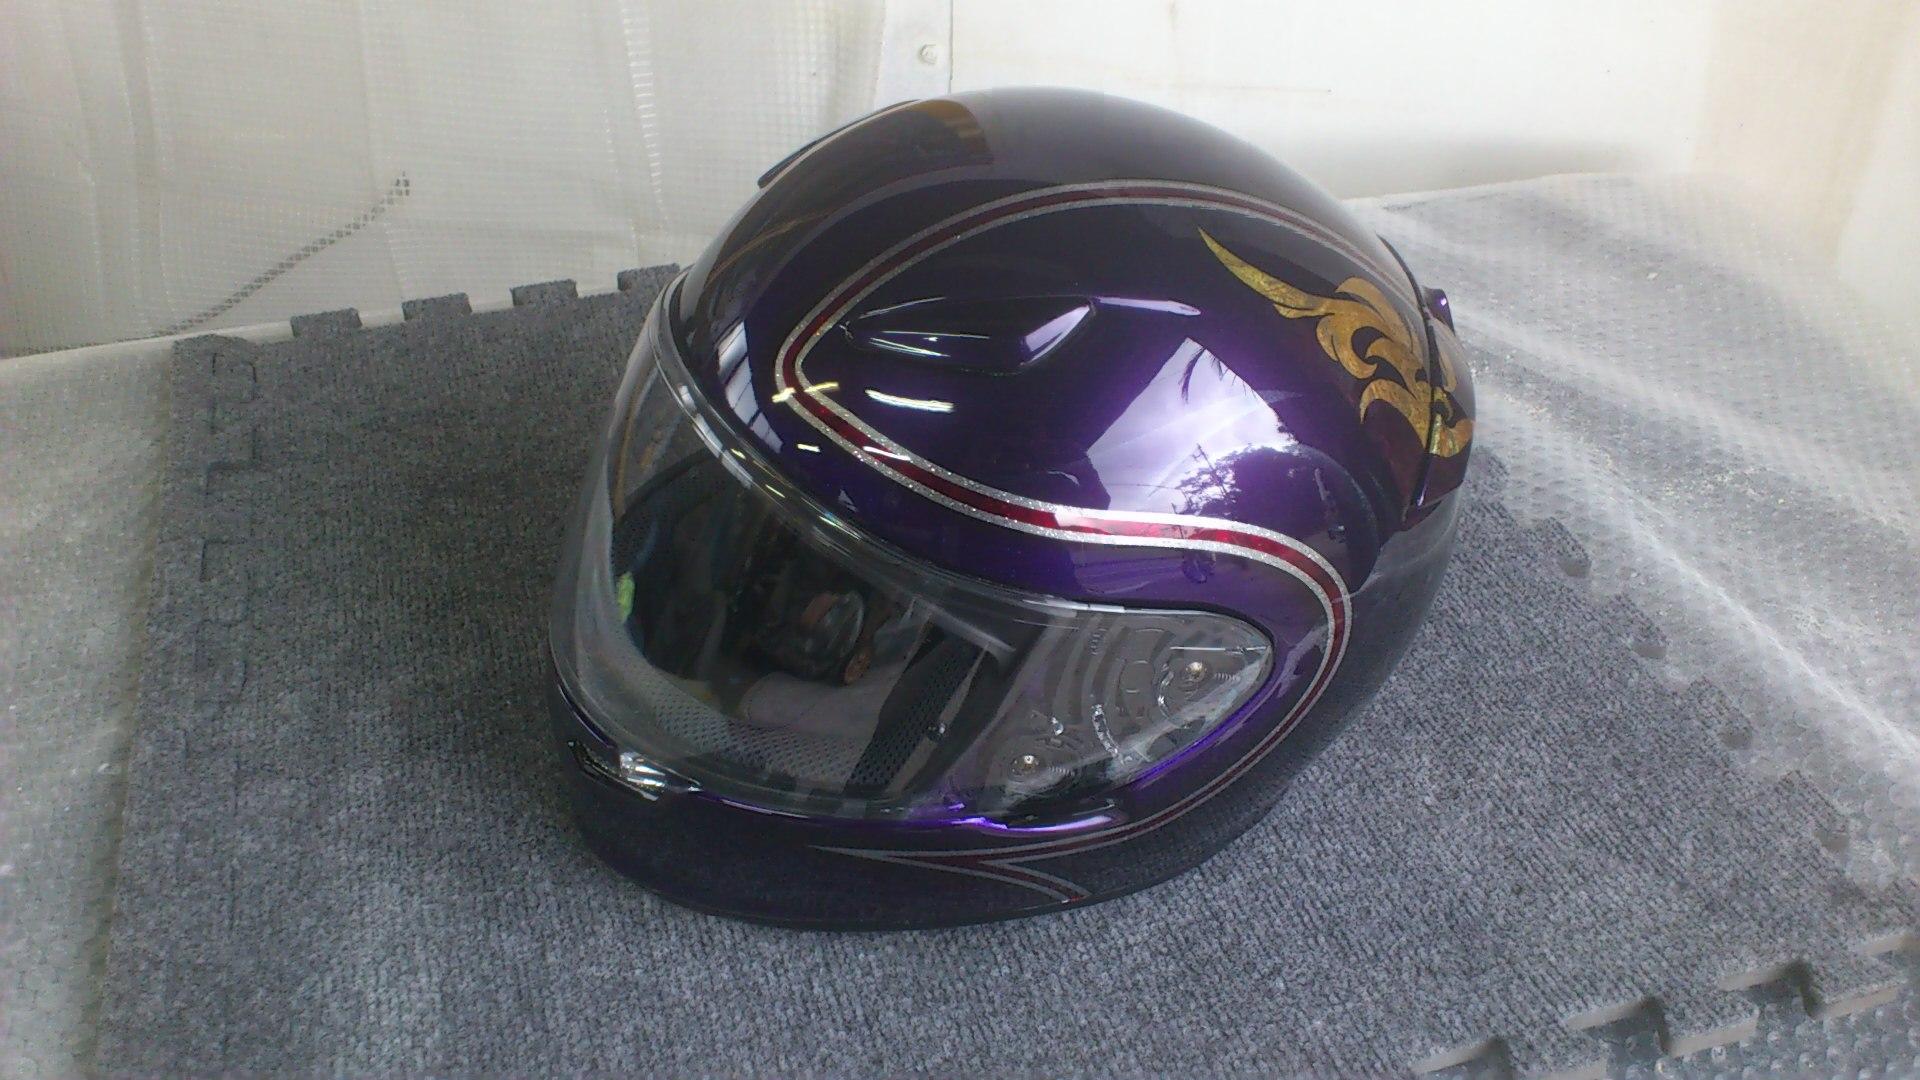 SHOEIフルフェイスヘルメット_e0269313_20254681.jpg